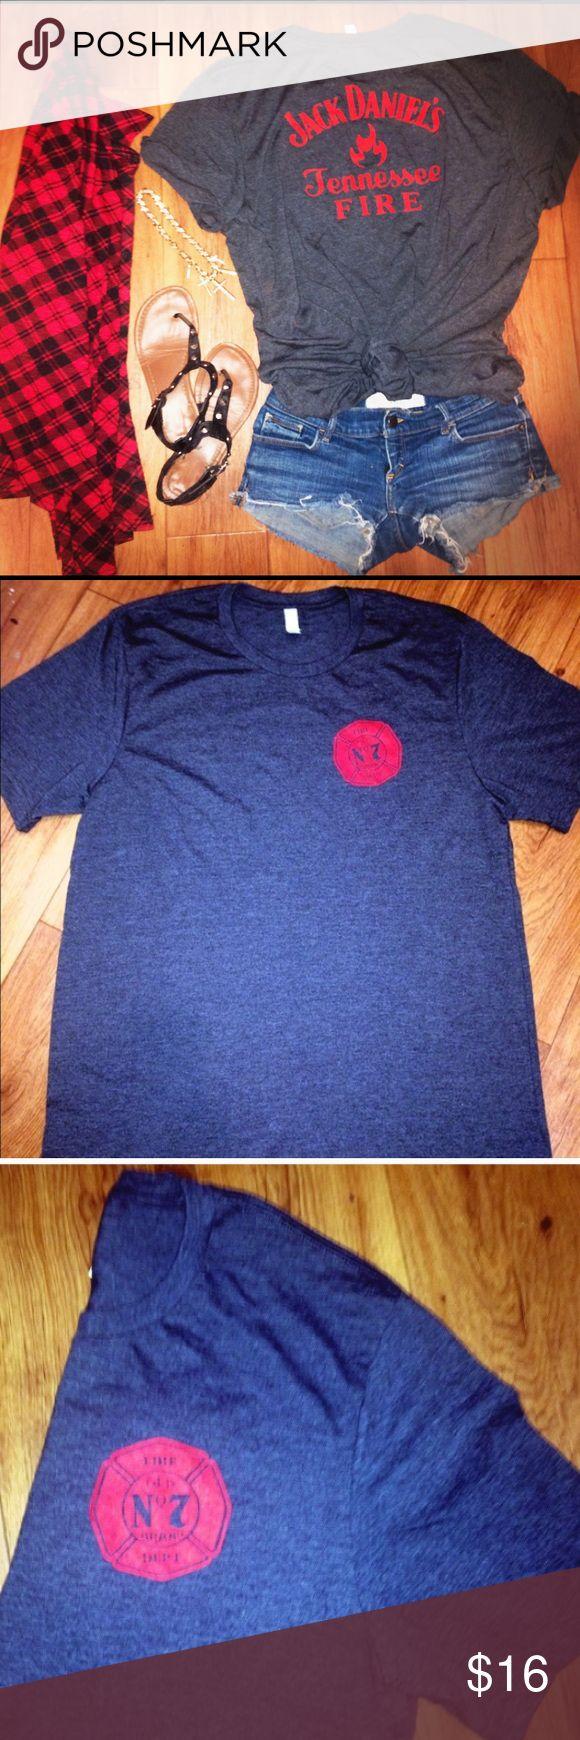 Design your own jack daniels t shirt - Jack Daniels Fire Whiskey Hipster Tshirt Jack Daniels Whisky Fire Tshirt Mens X Large